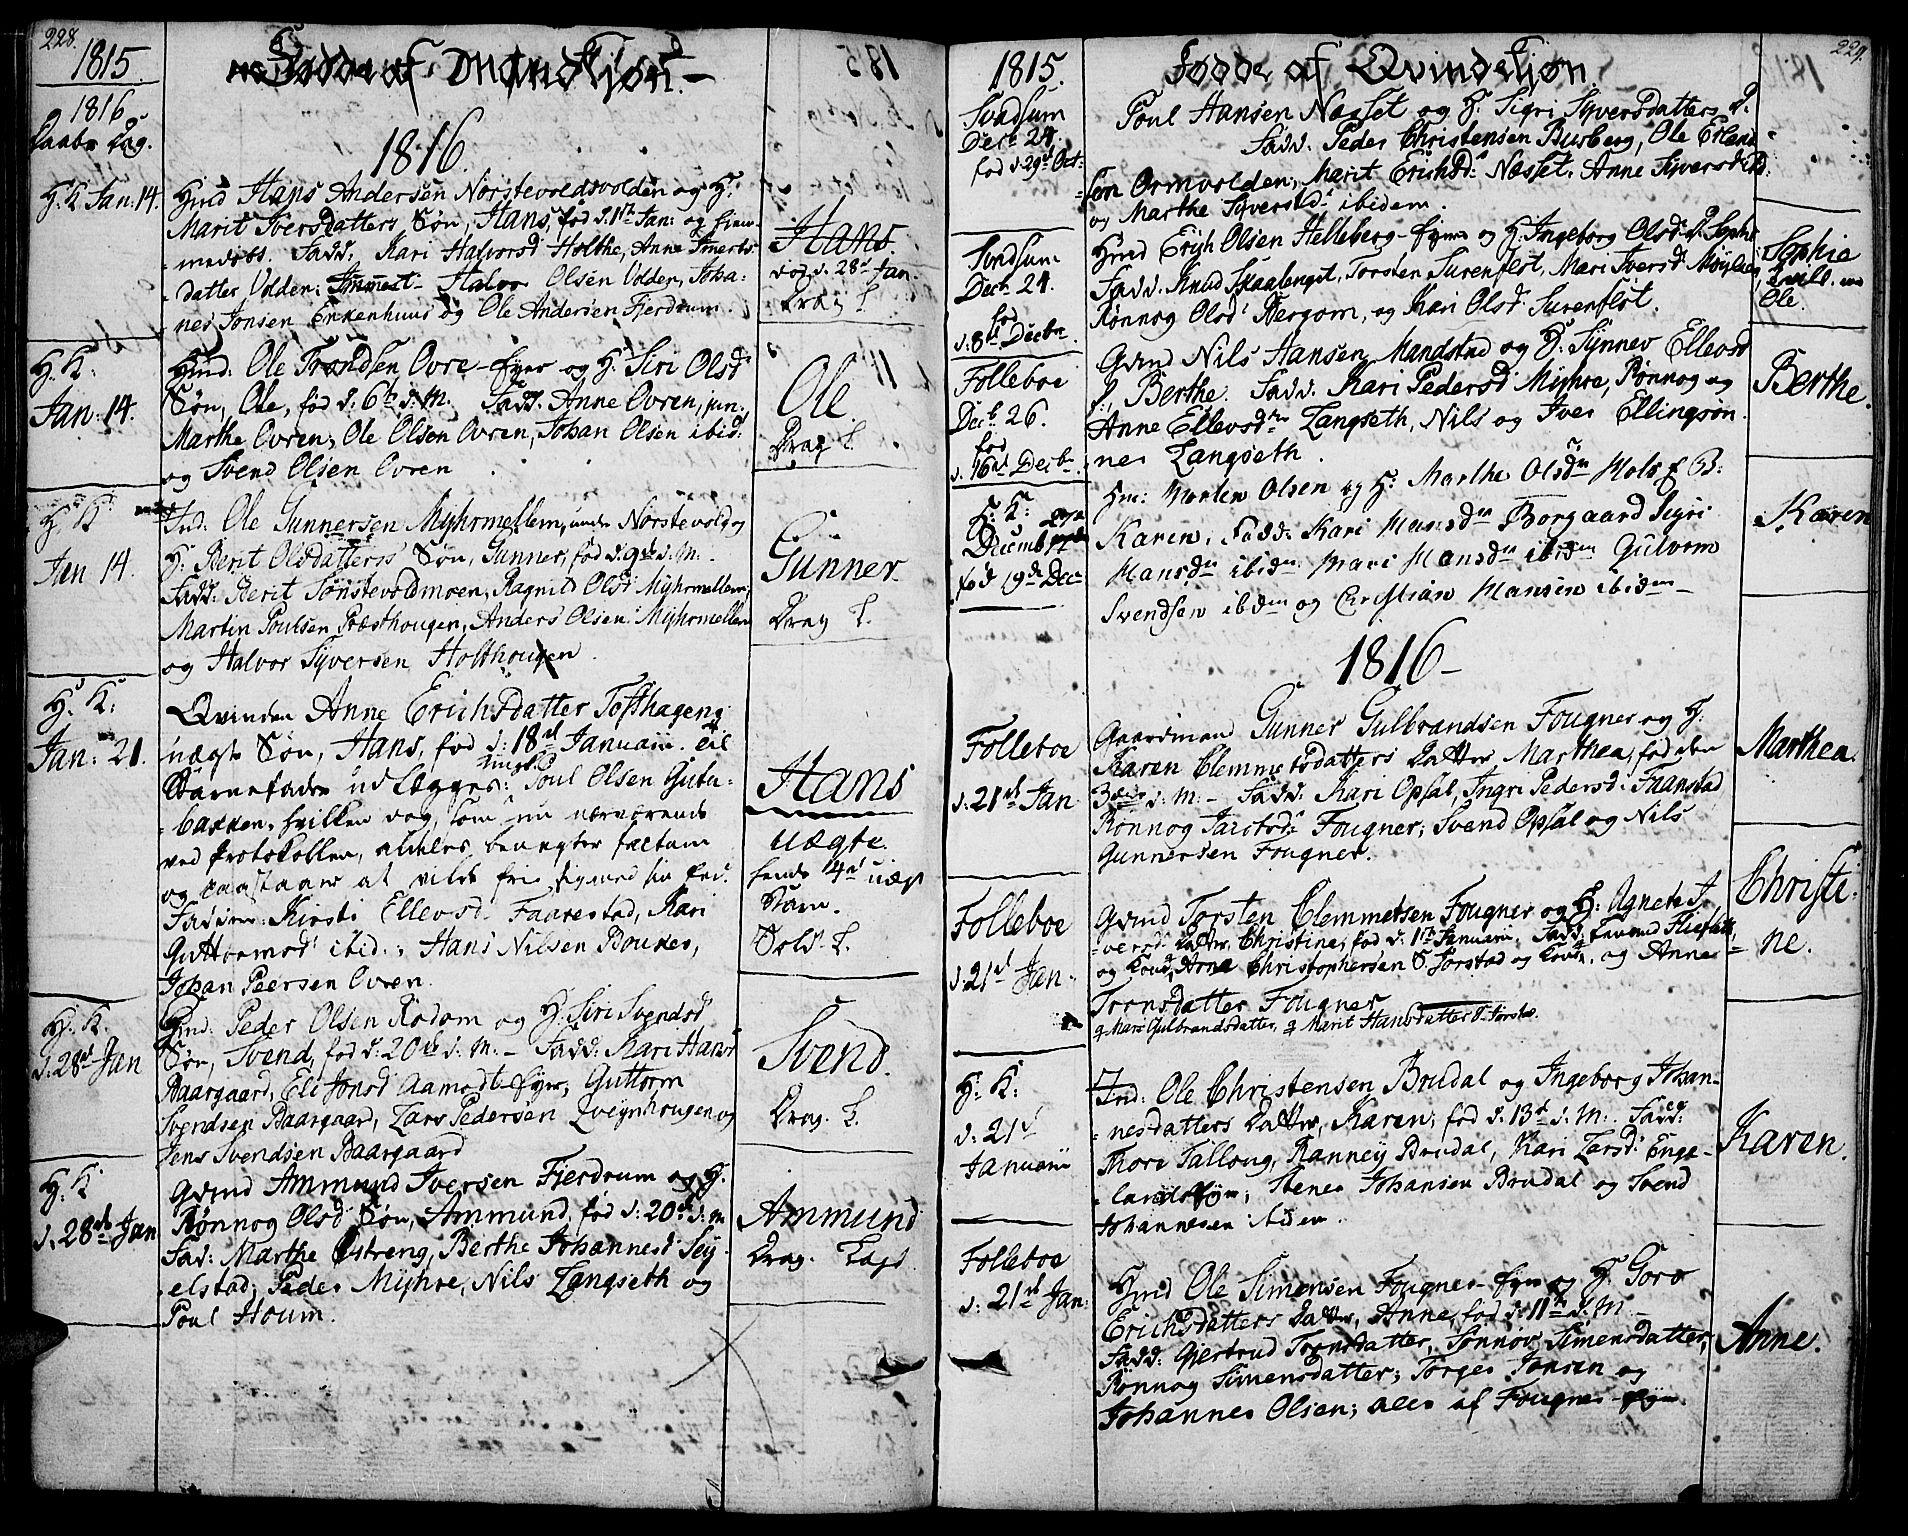 SAH, Gausdal prestekontor, Ministerialbok nr. 4, 1809-1817, s. 228-229